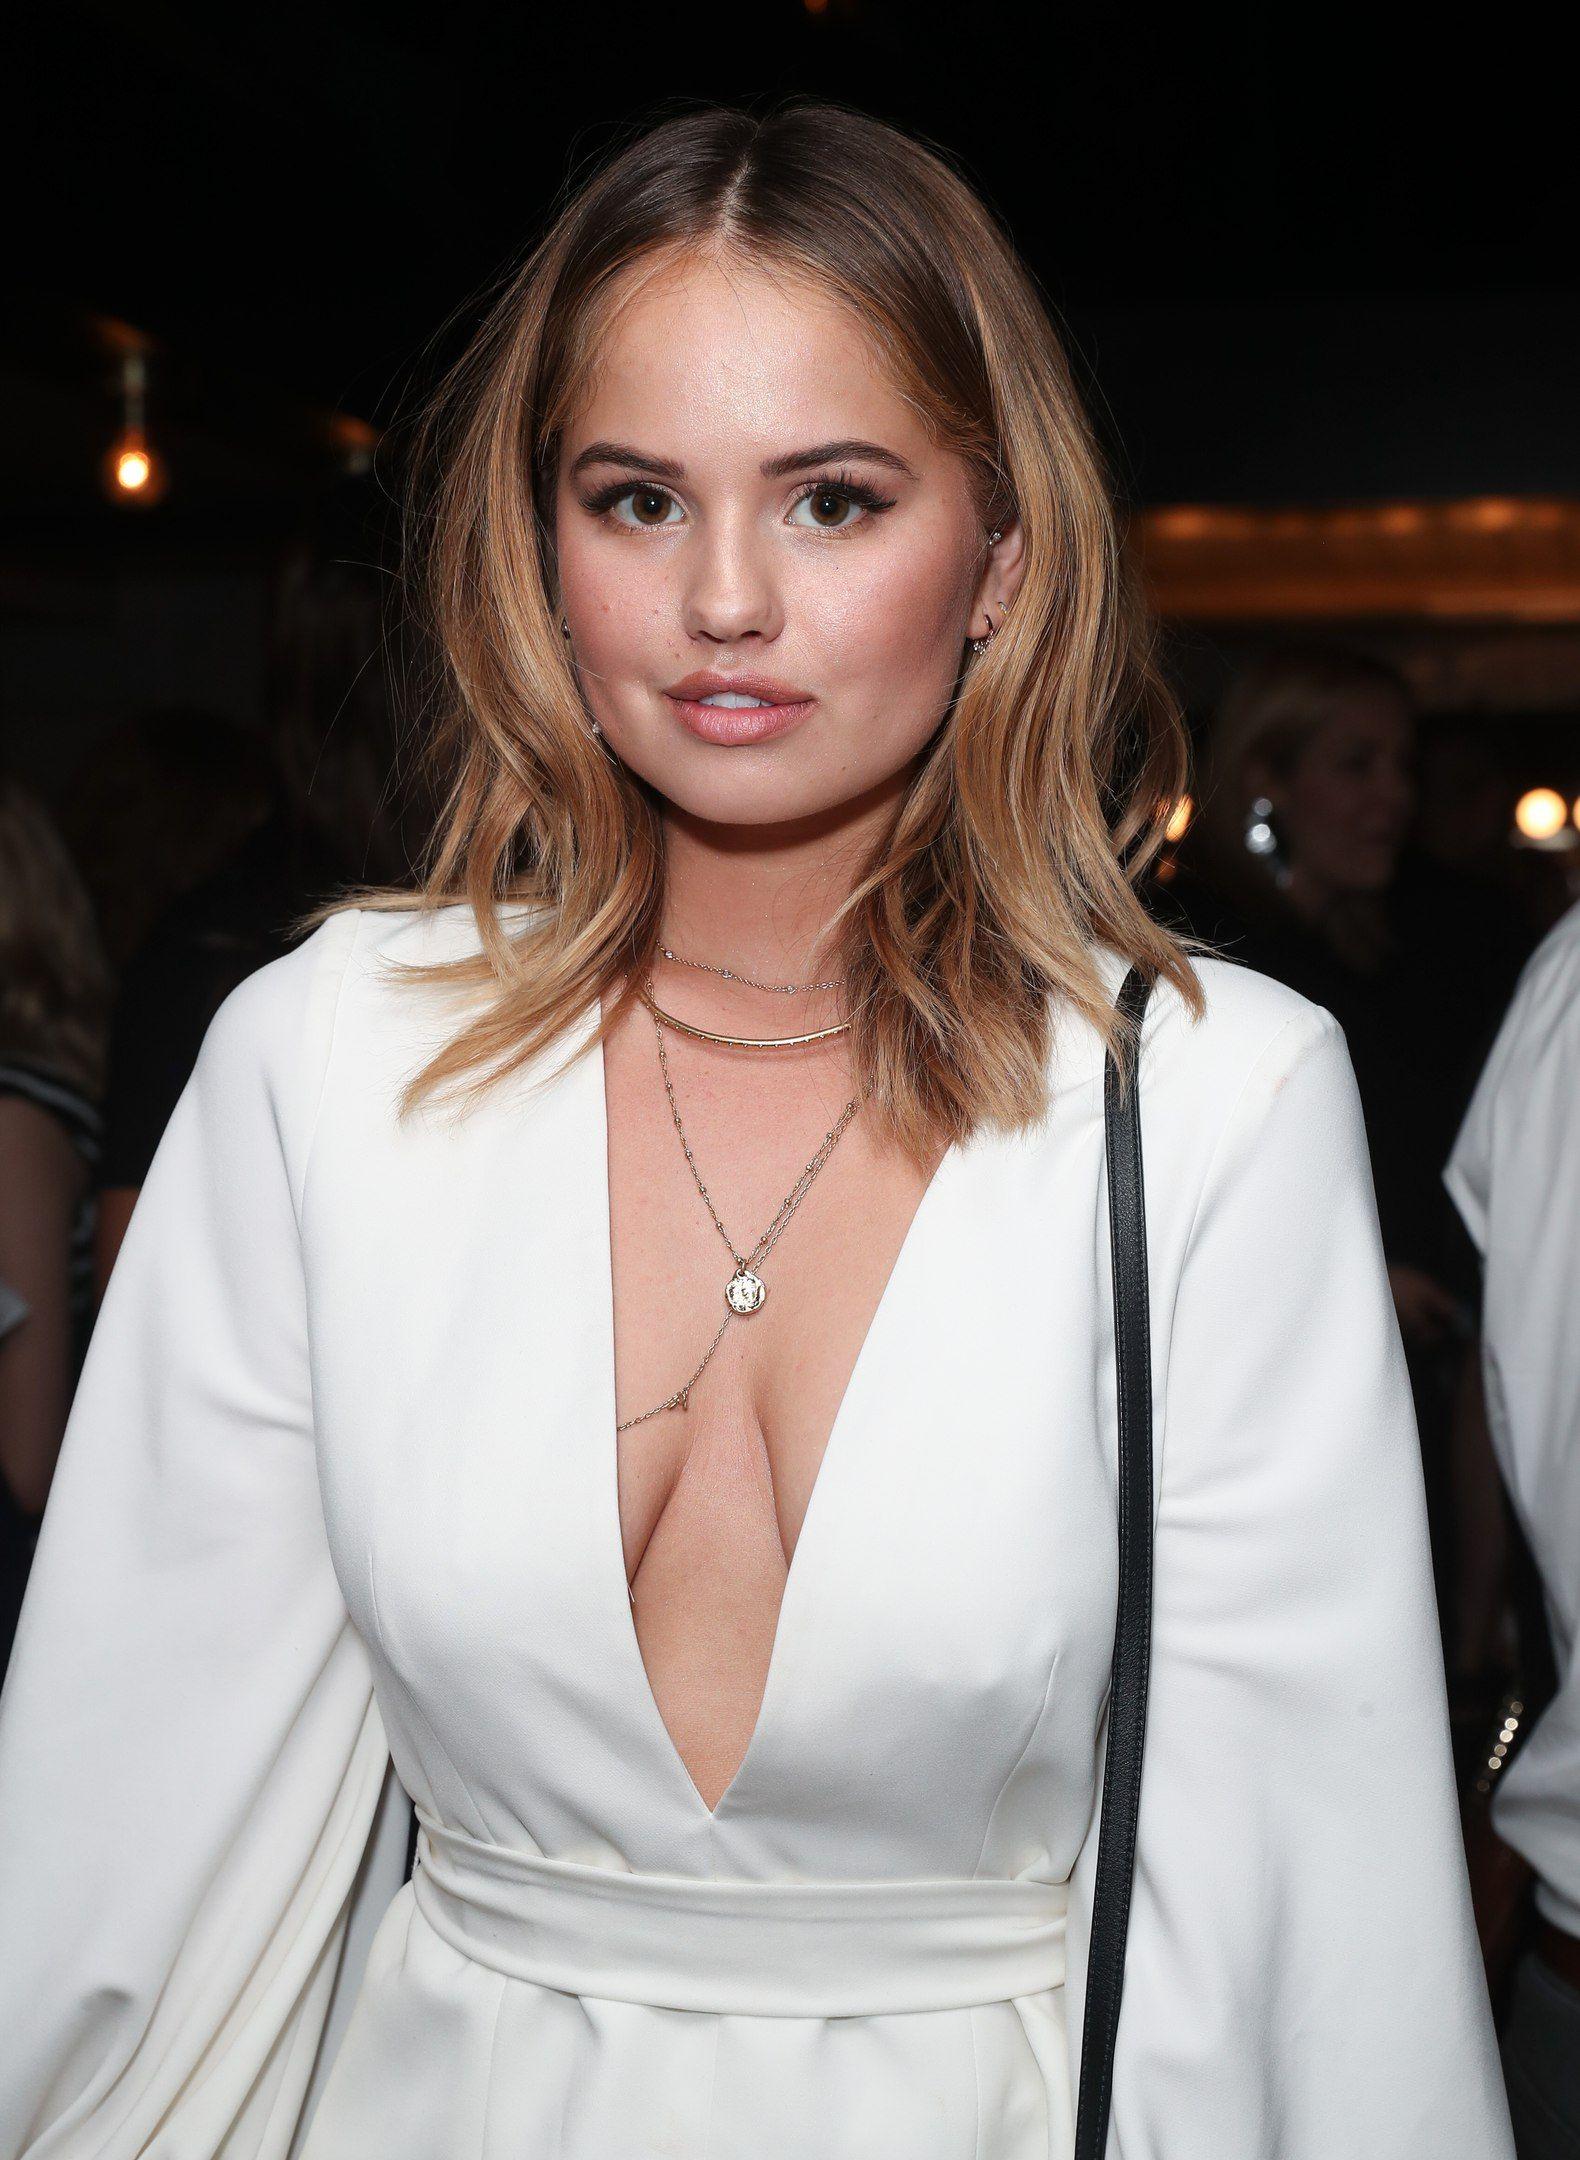 Catherine Tyldesley. 2018-2019 celebrityes photos leaks! recommendations